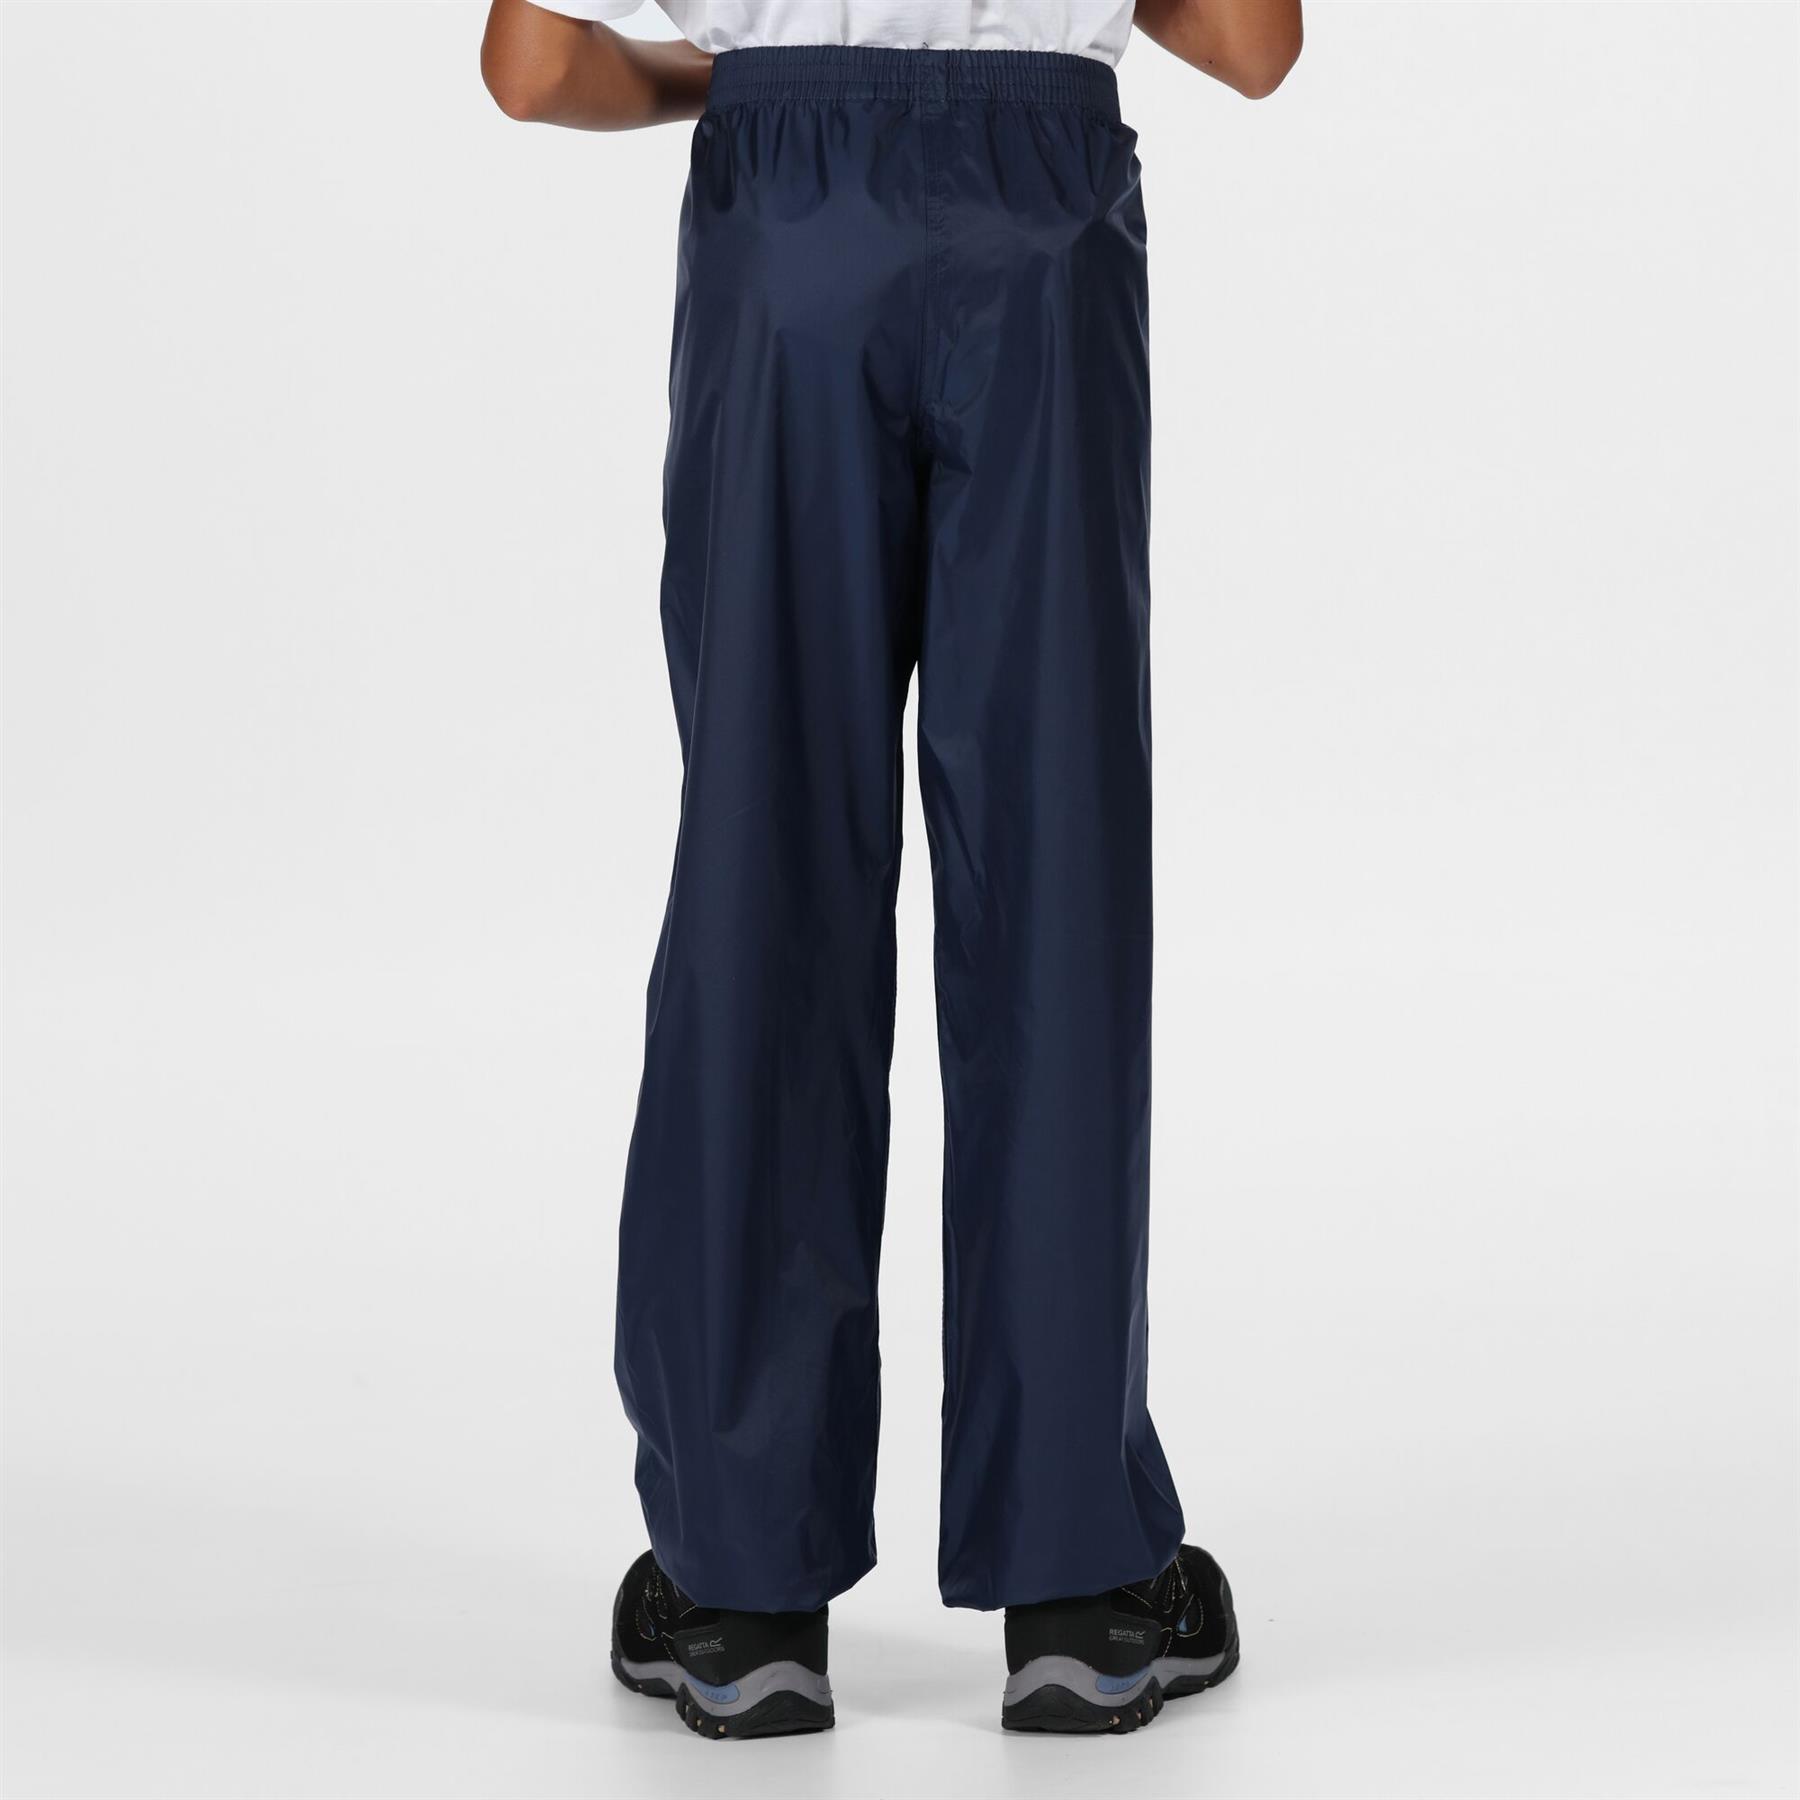 miniatuur 9 - Regatta Kids Pack It Waterproof Packable Overtrousers Boys Girls Trousers